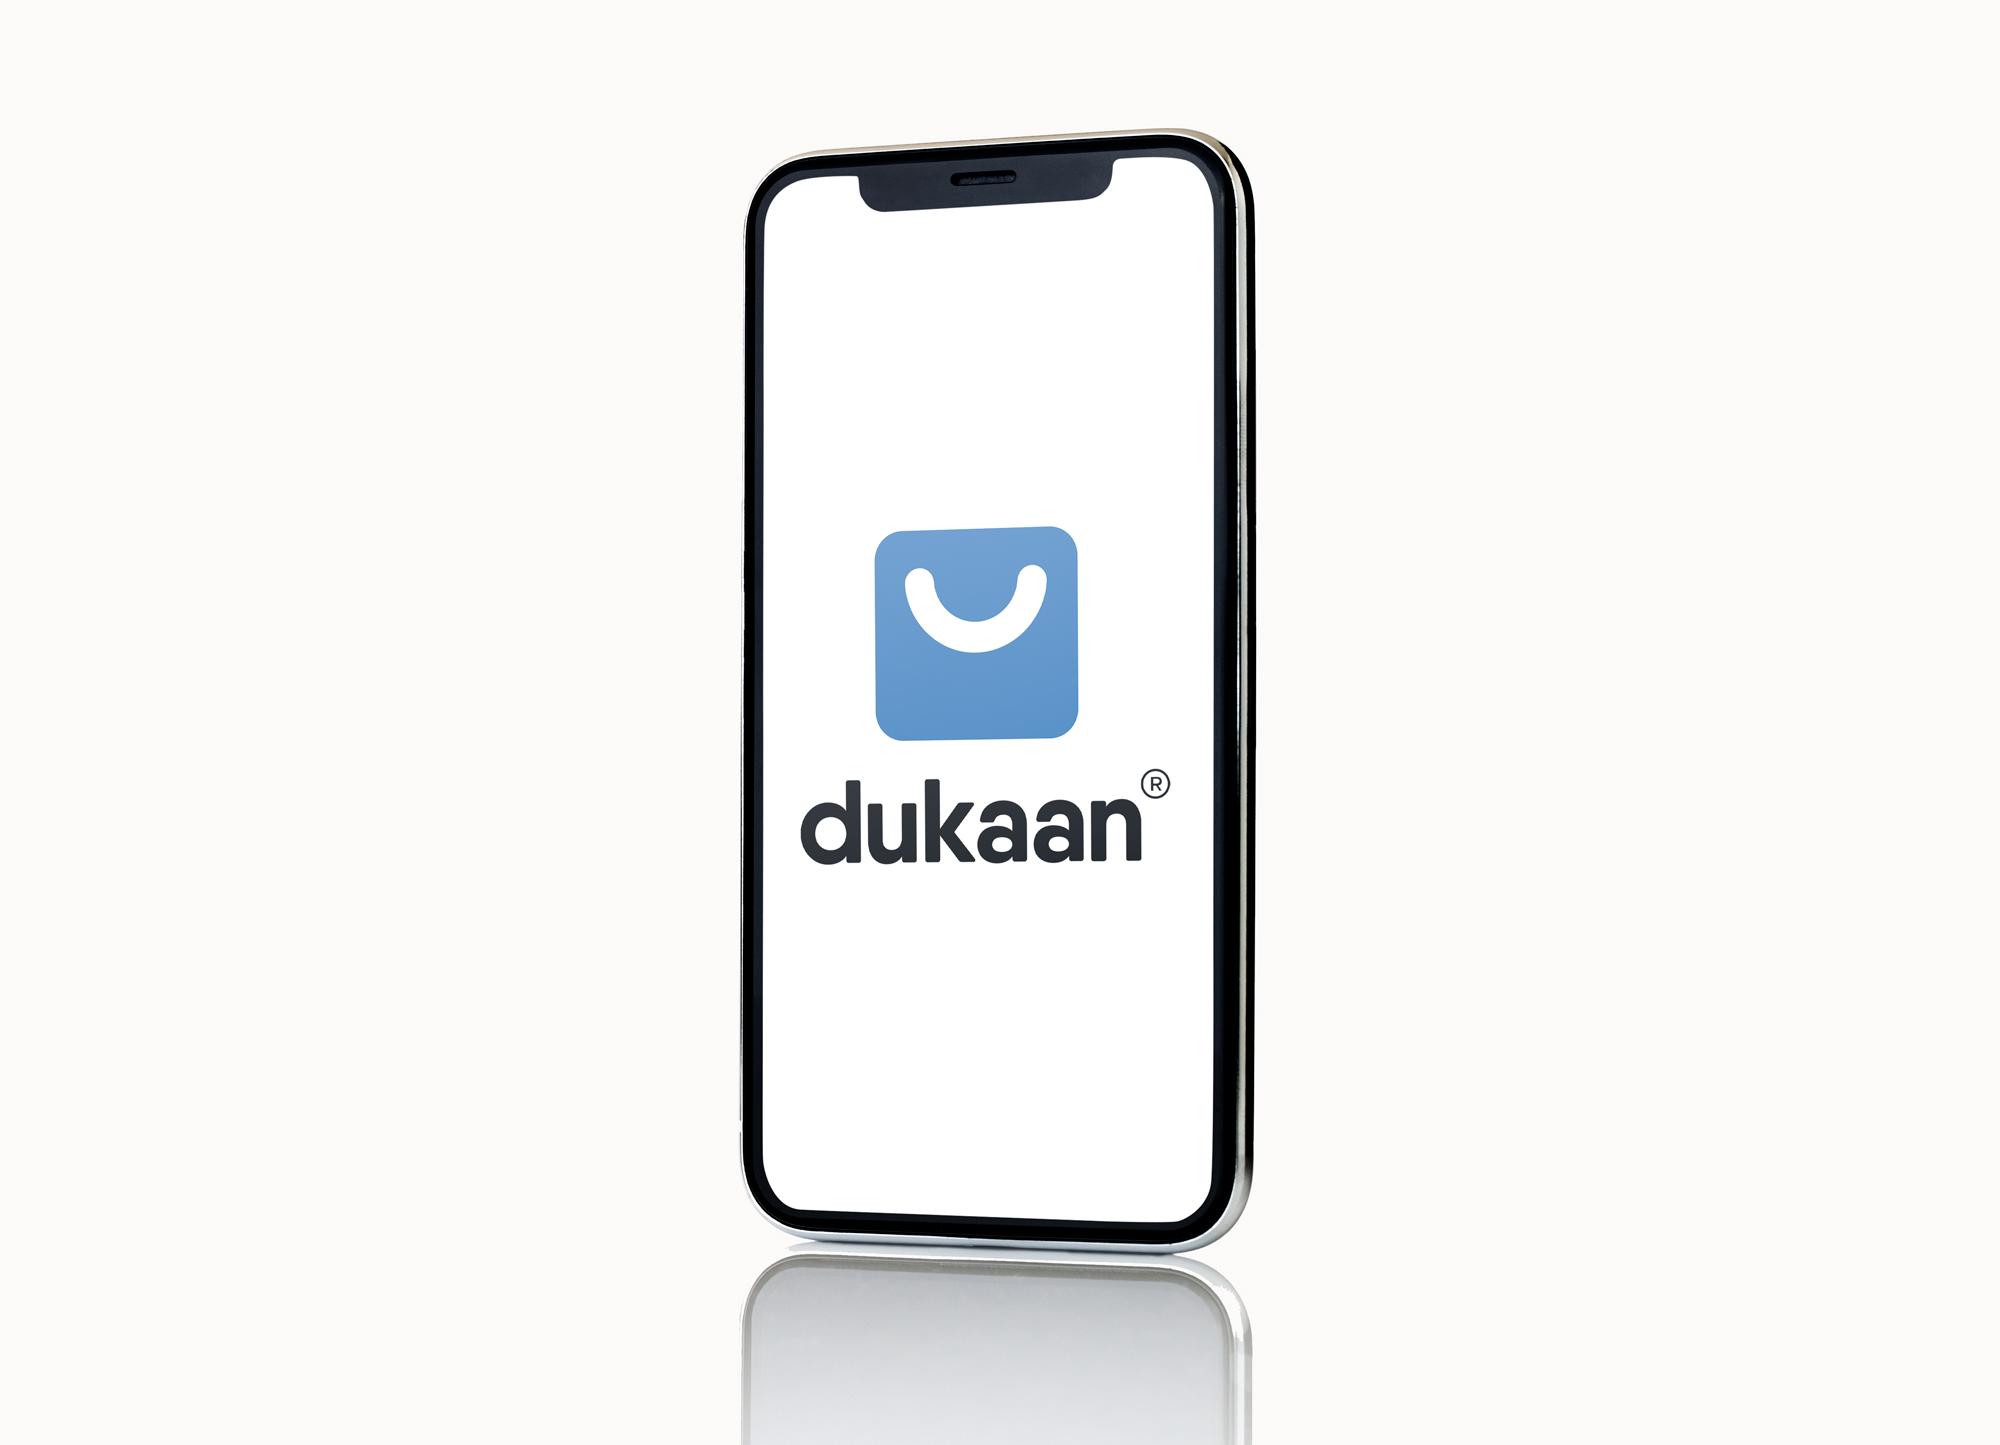 Dukaan logo displayed on iPhone 11